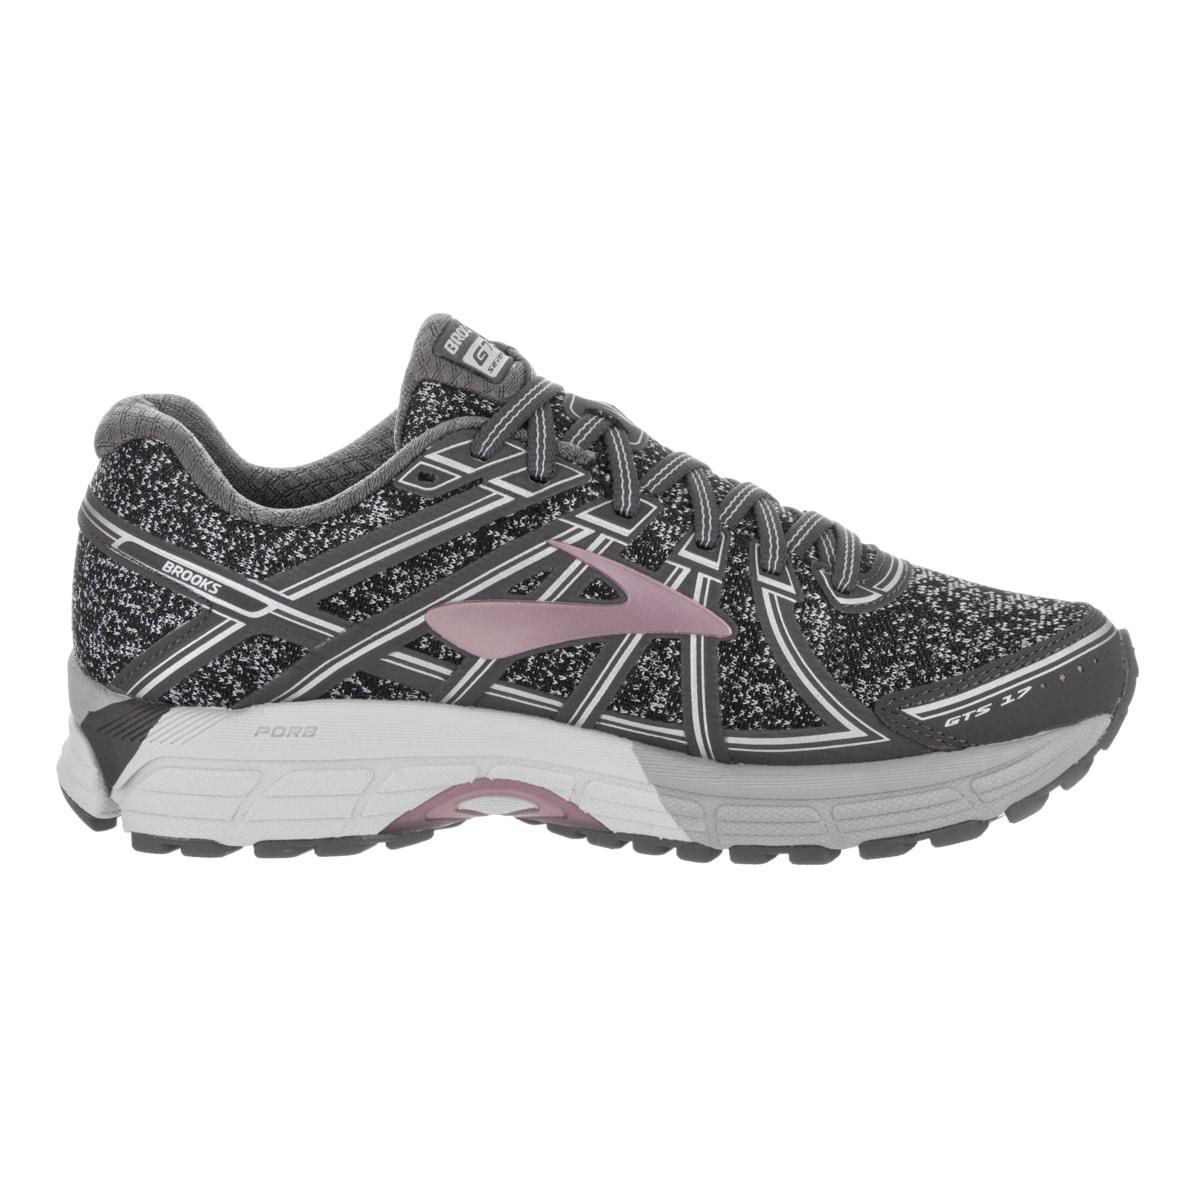 Shop Brooks Women s Adrenaline GTS 17 Running Shoe - Free Shipping Today -  Overstock - 16850392 152df7c51c